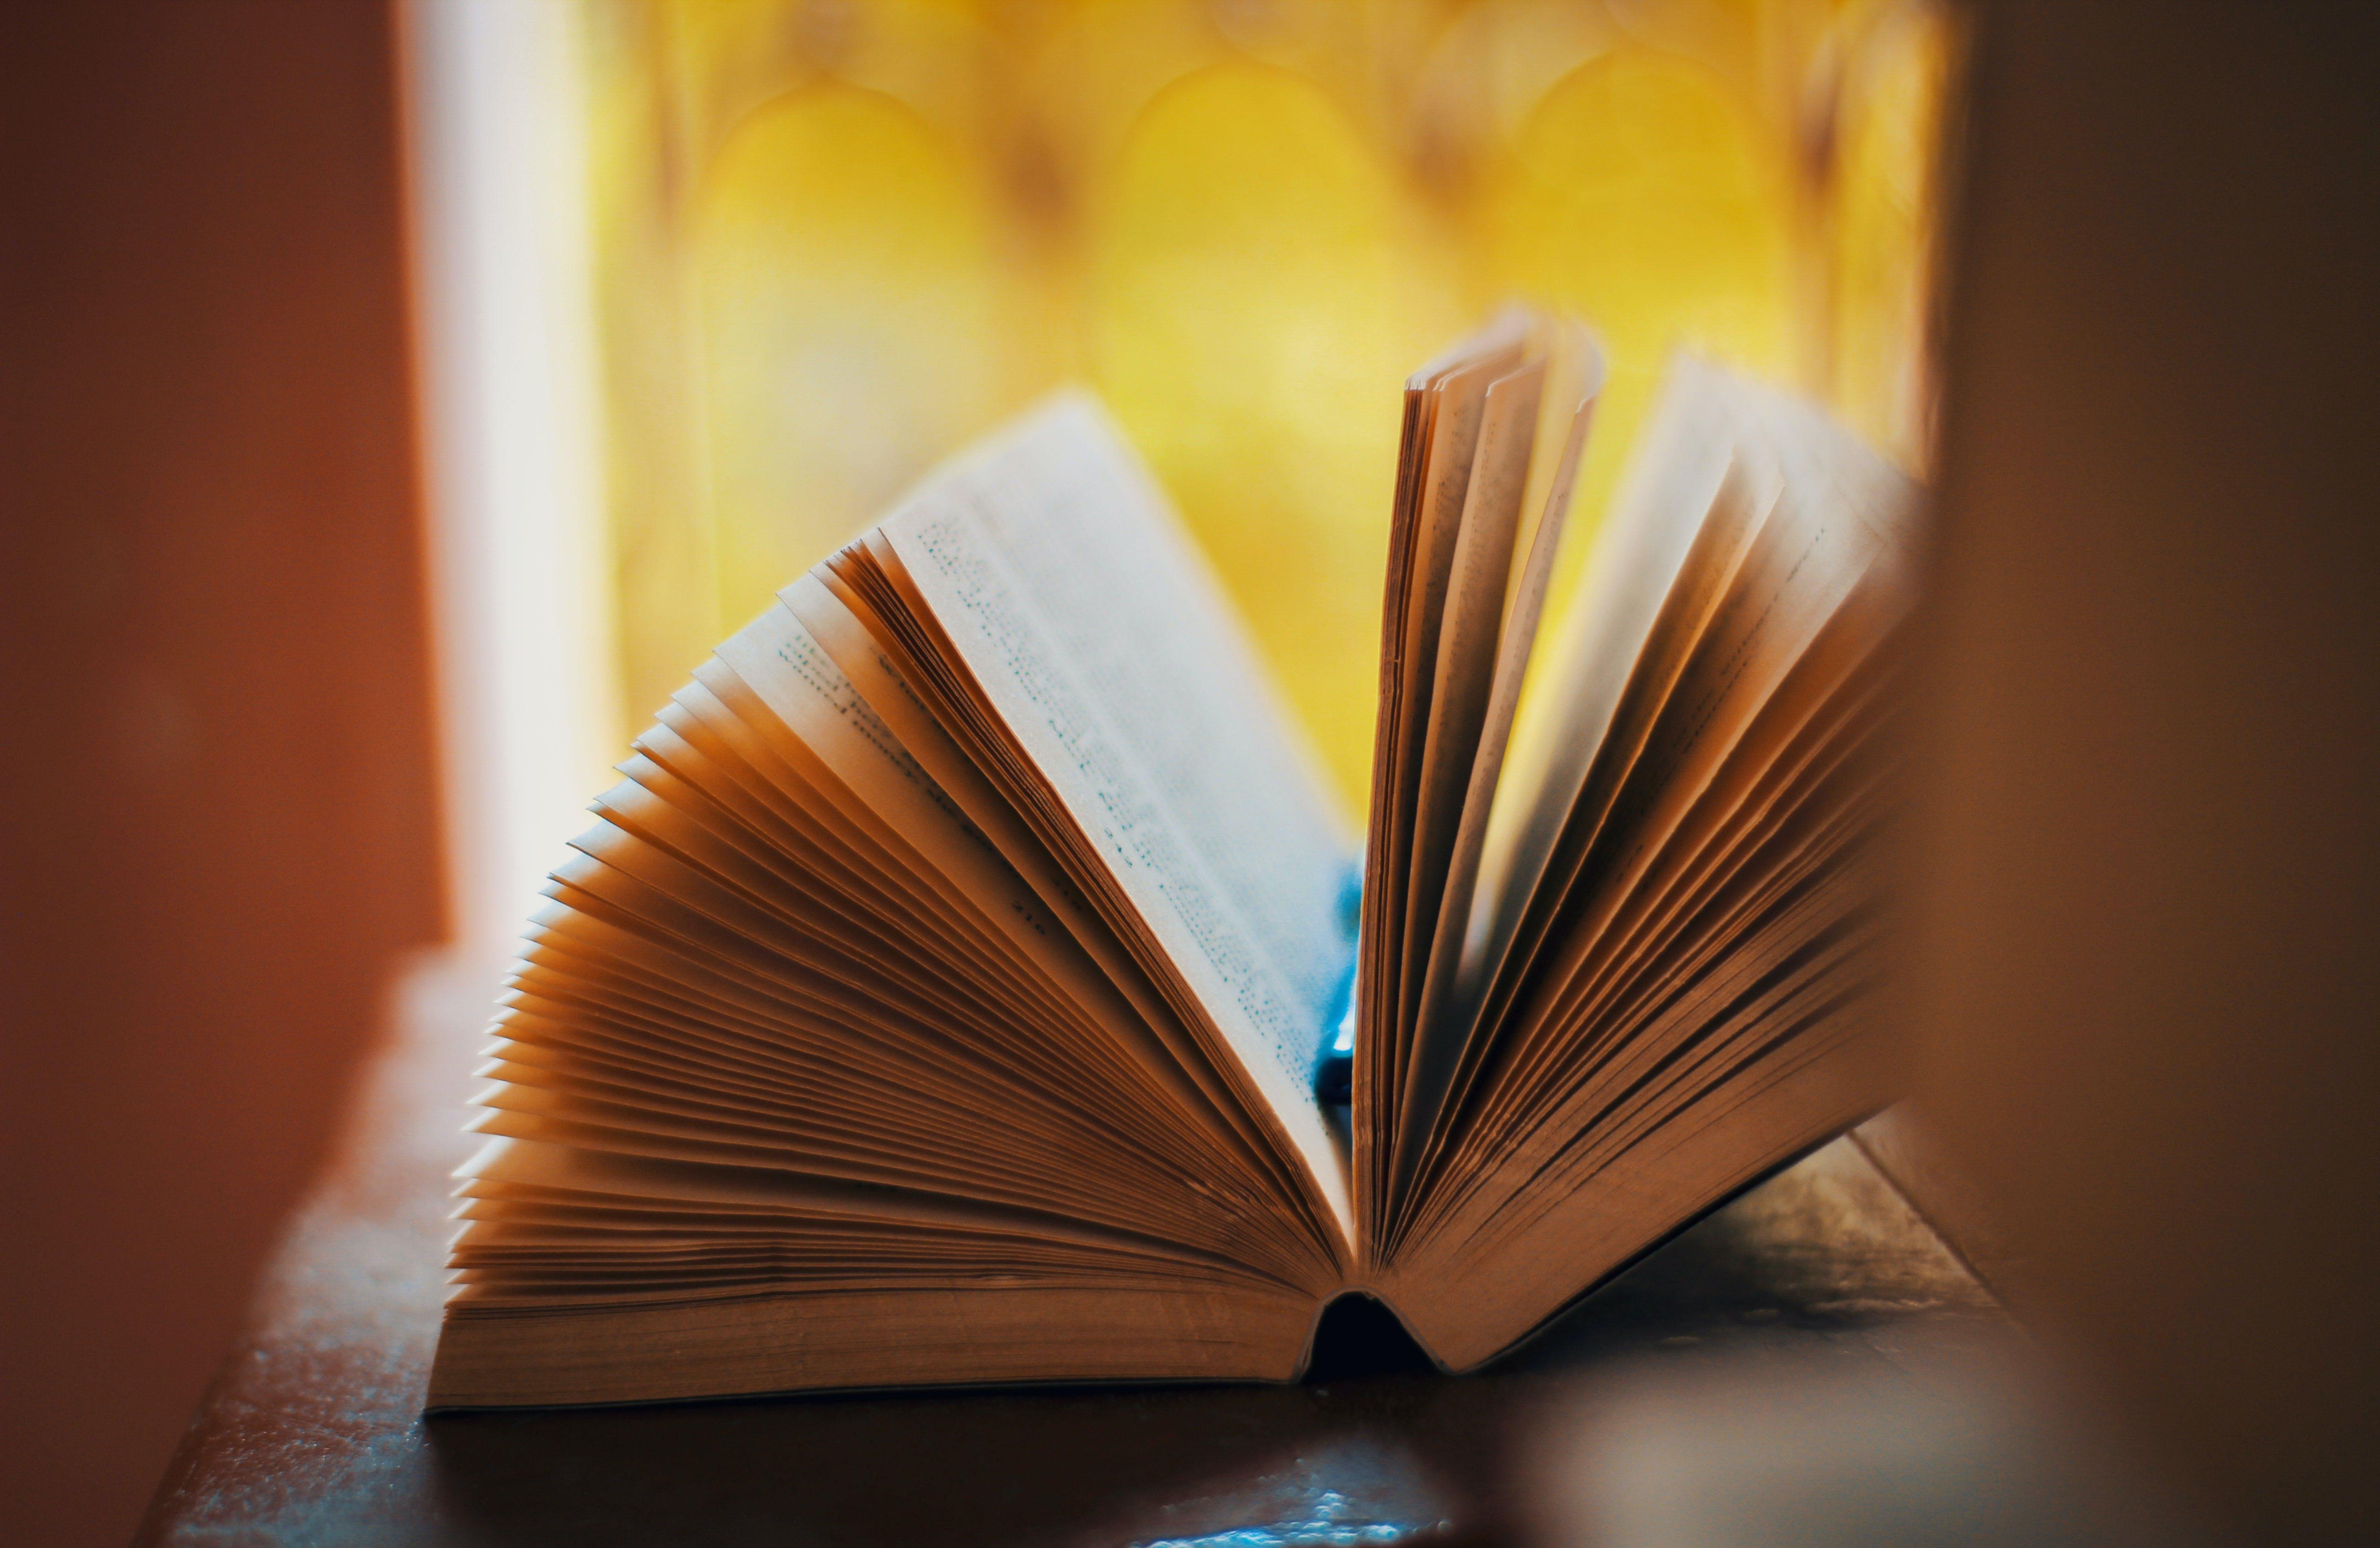 bog, litteratur, sider